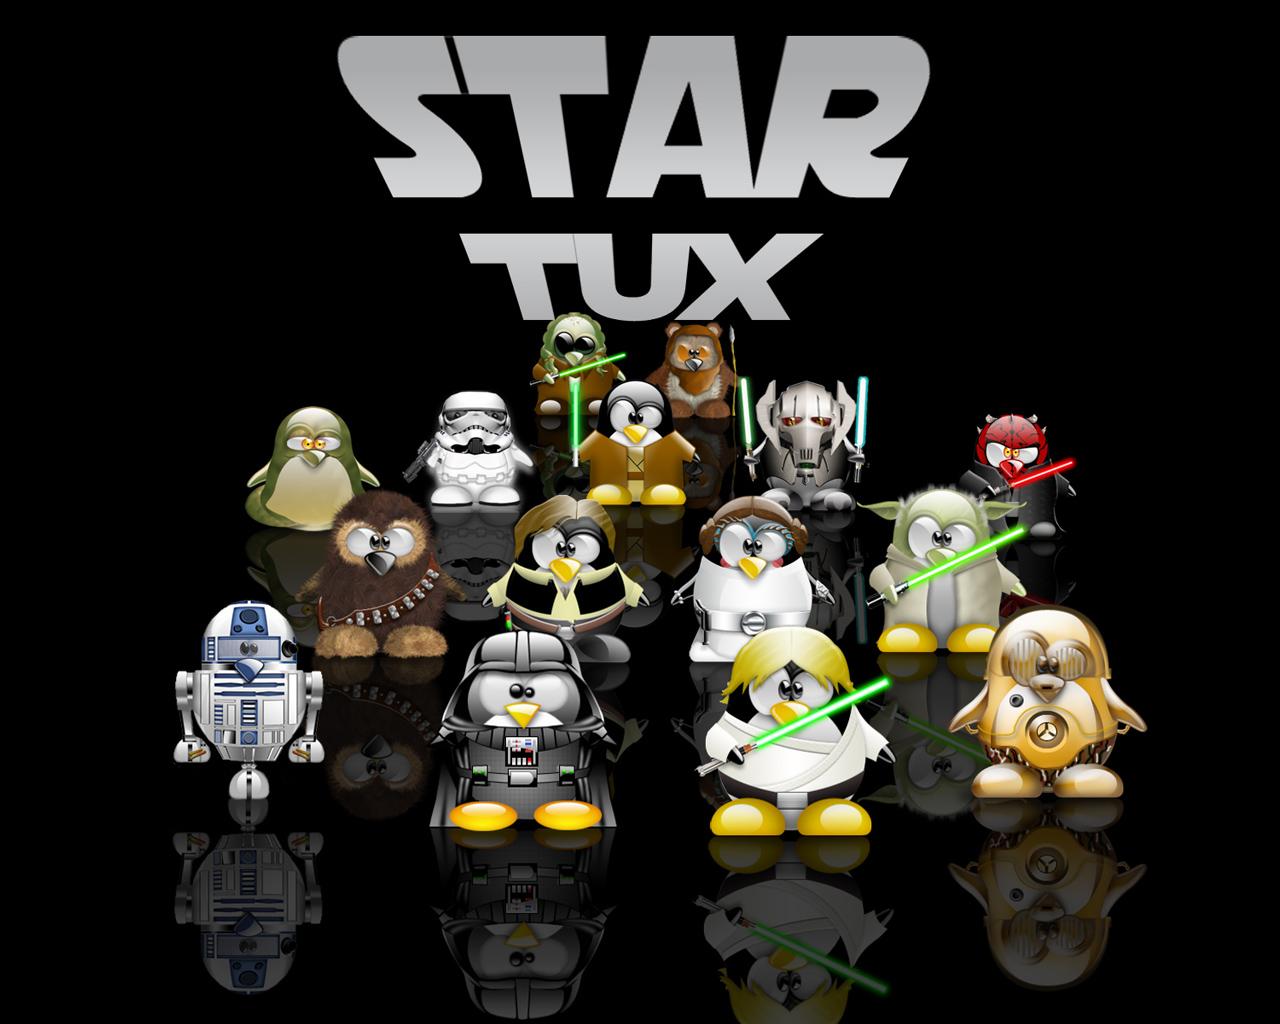 67742-Tux war_black_sxga